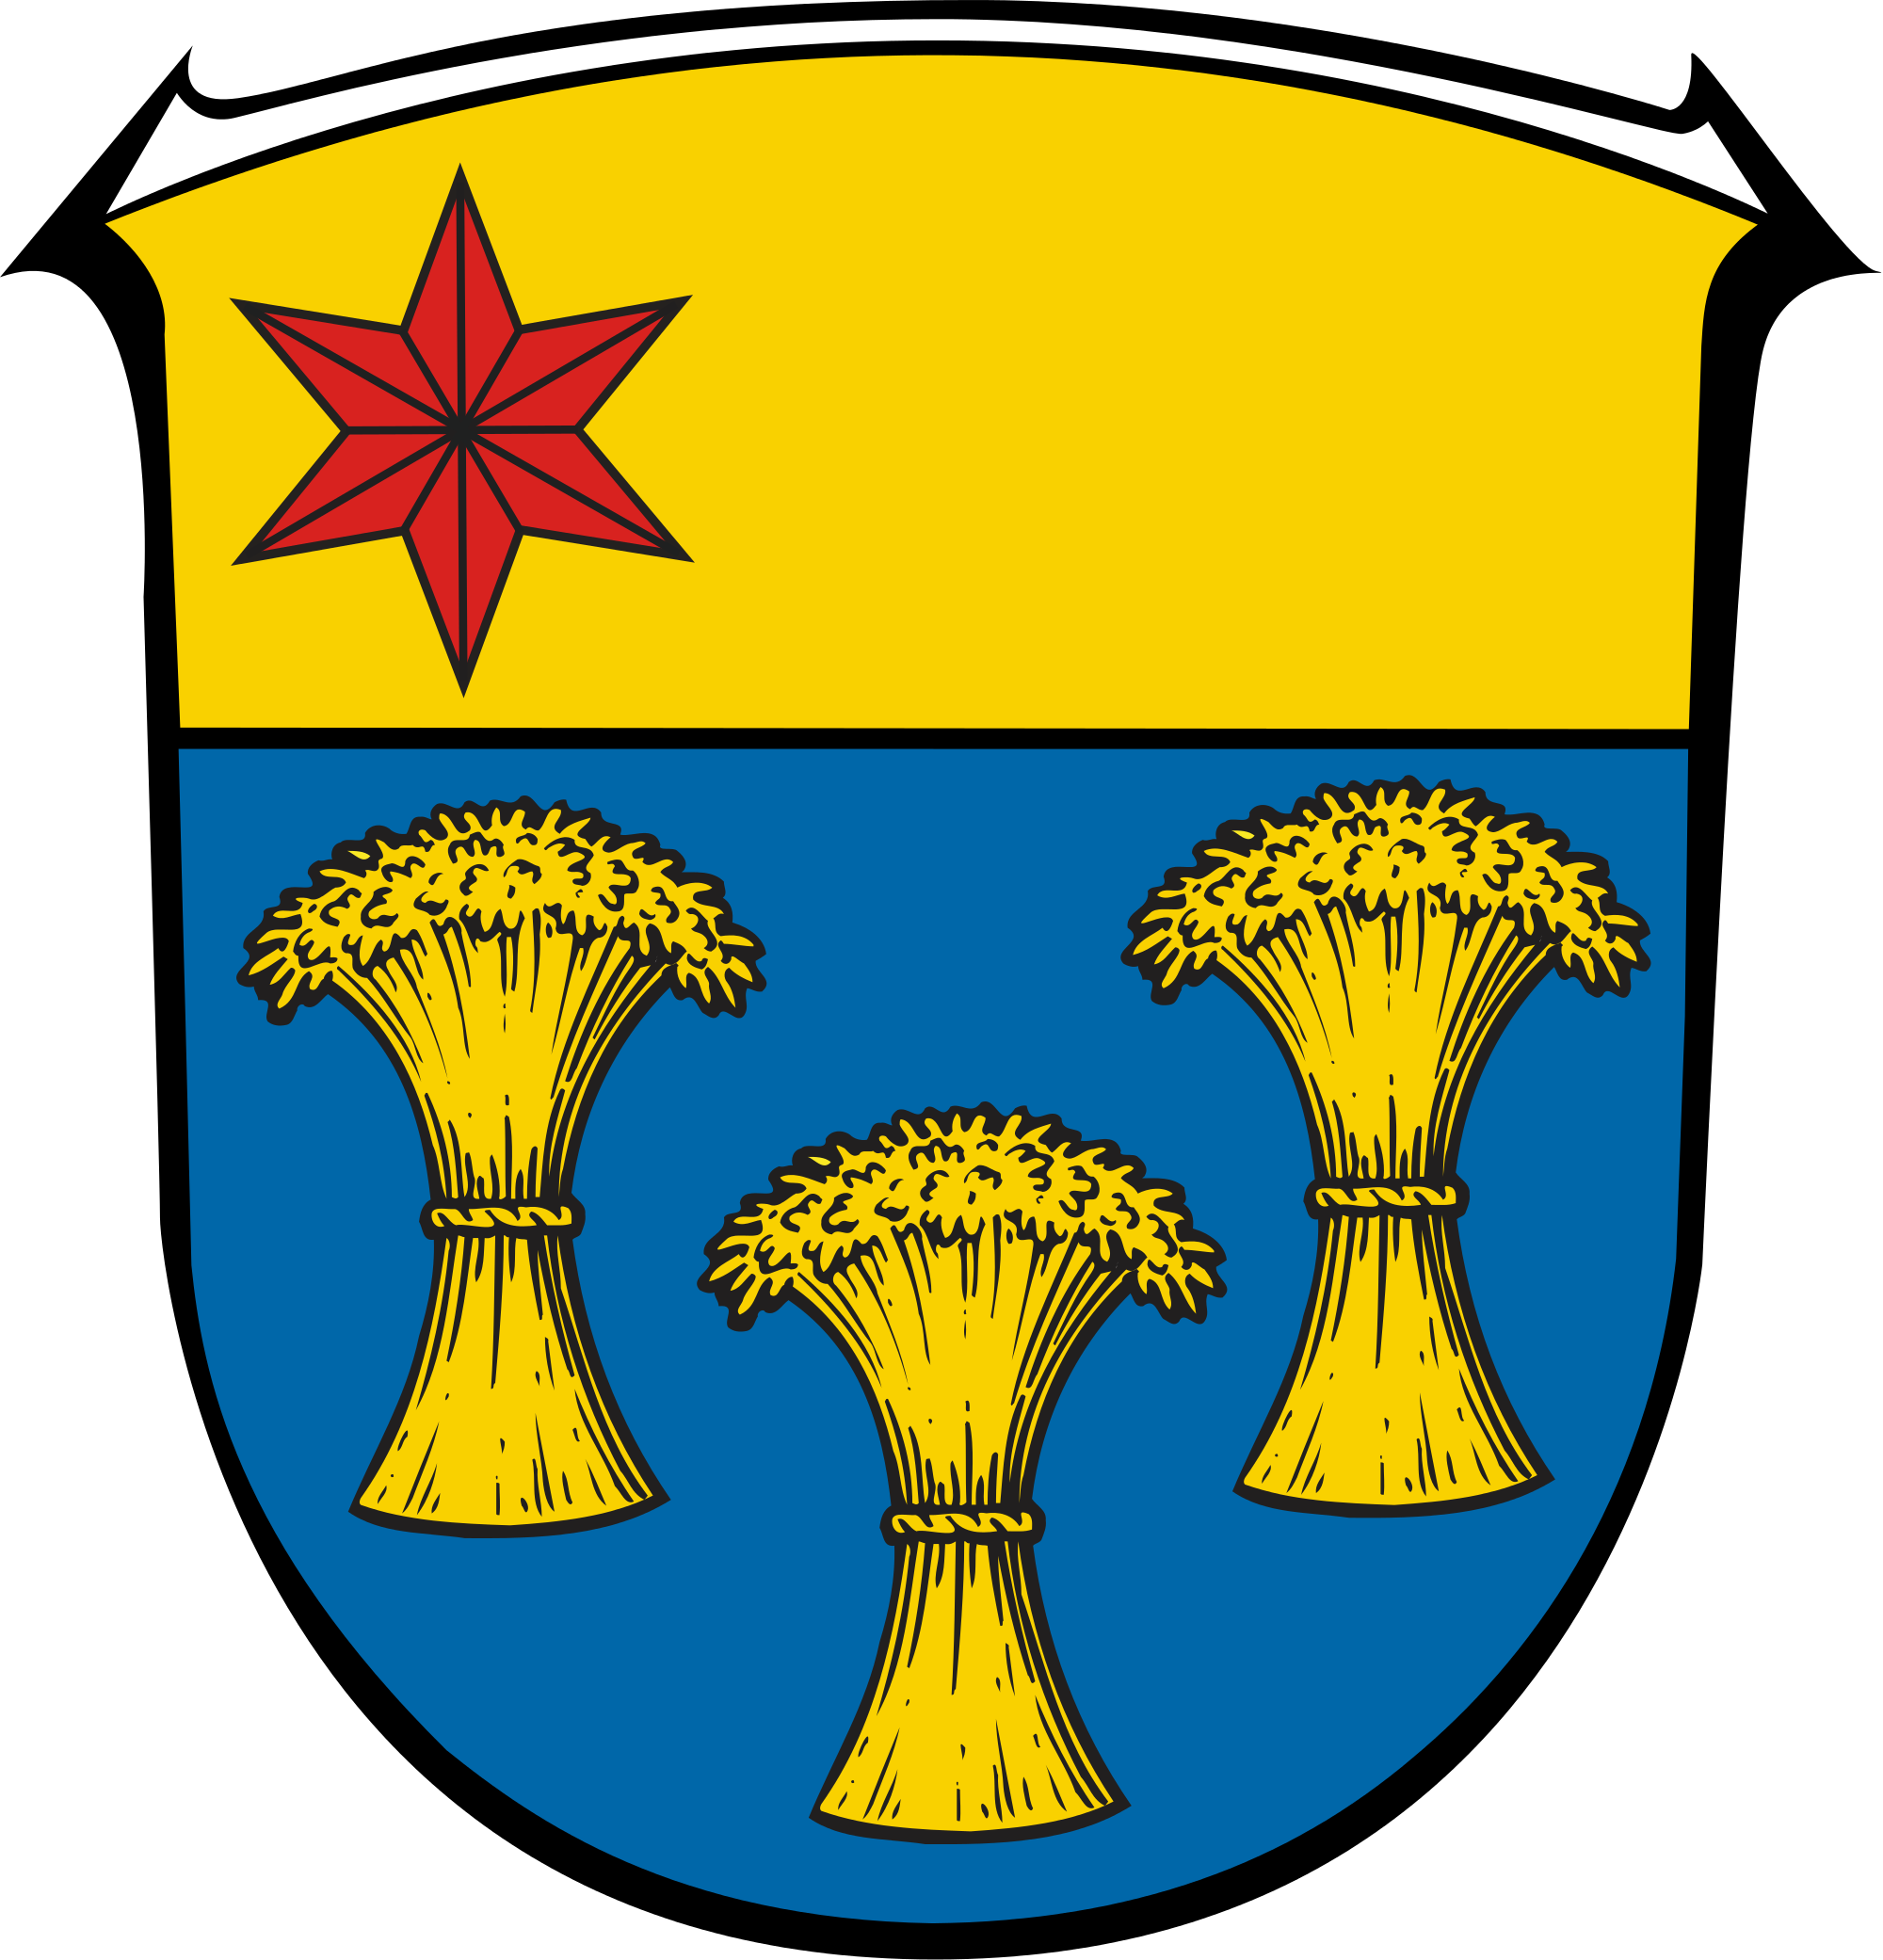 File:Wappen Buchenau(Lahn).svg.